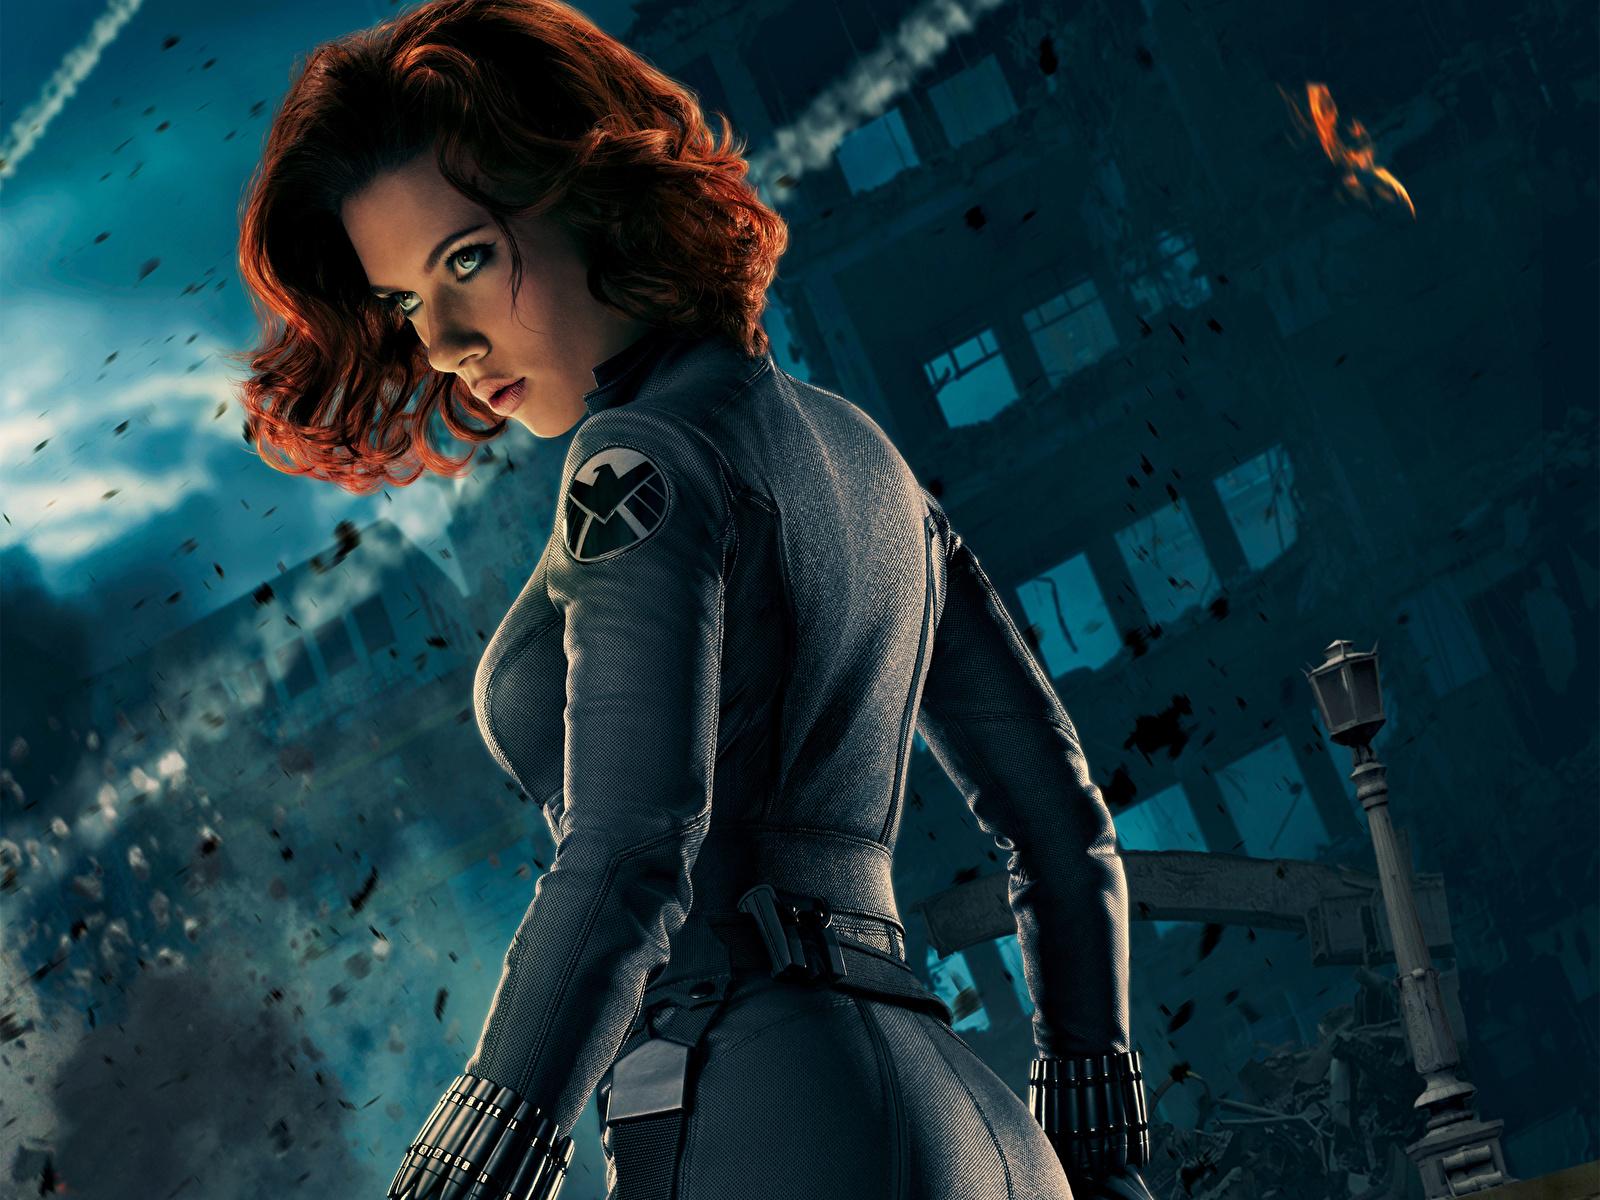 Images The Avengers (2012 film) Scarlett Johansson Redhead girl BLACK WIDOW Girls Movies Celebrities 1600x1200 female young woman film